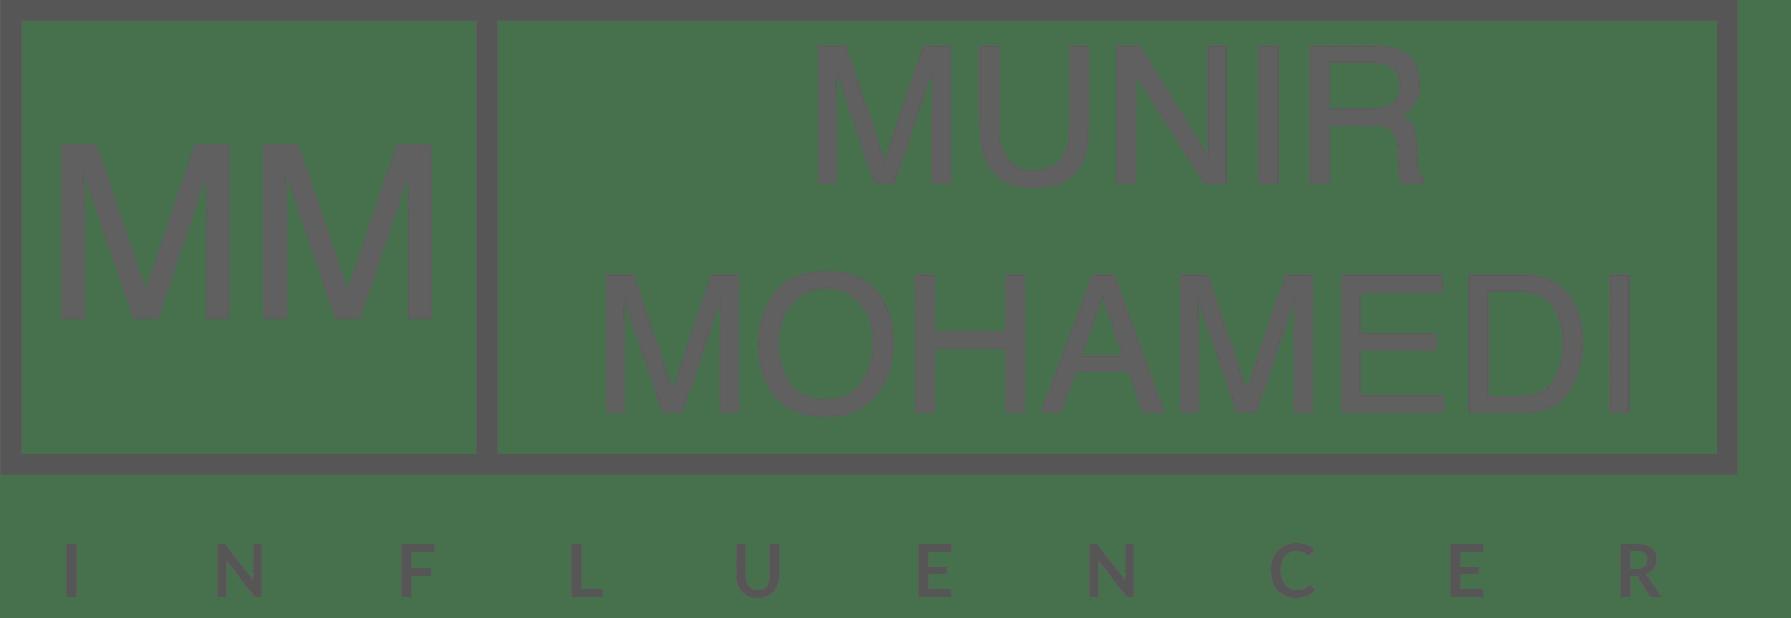 Munir Mohamedi